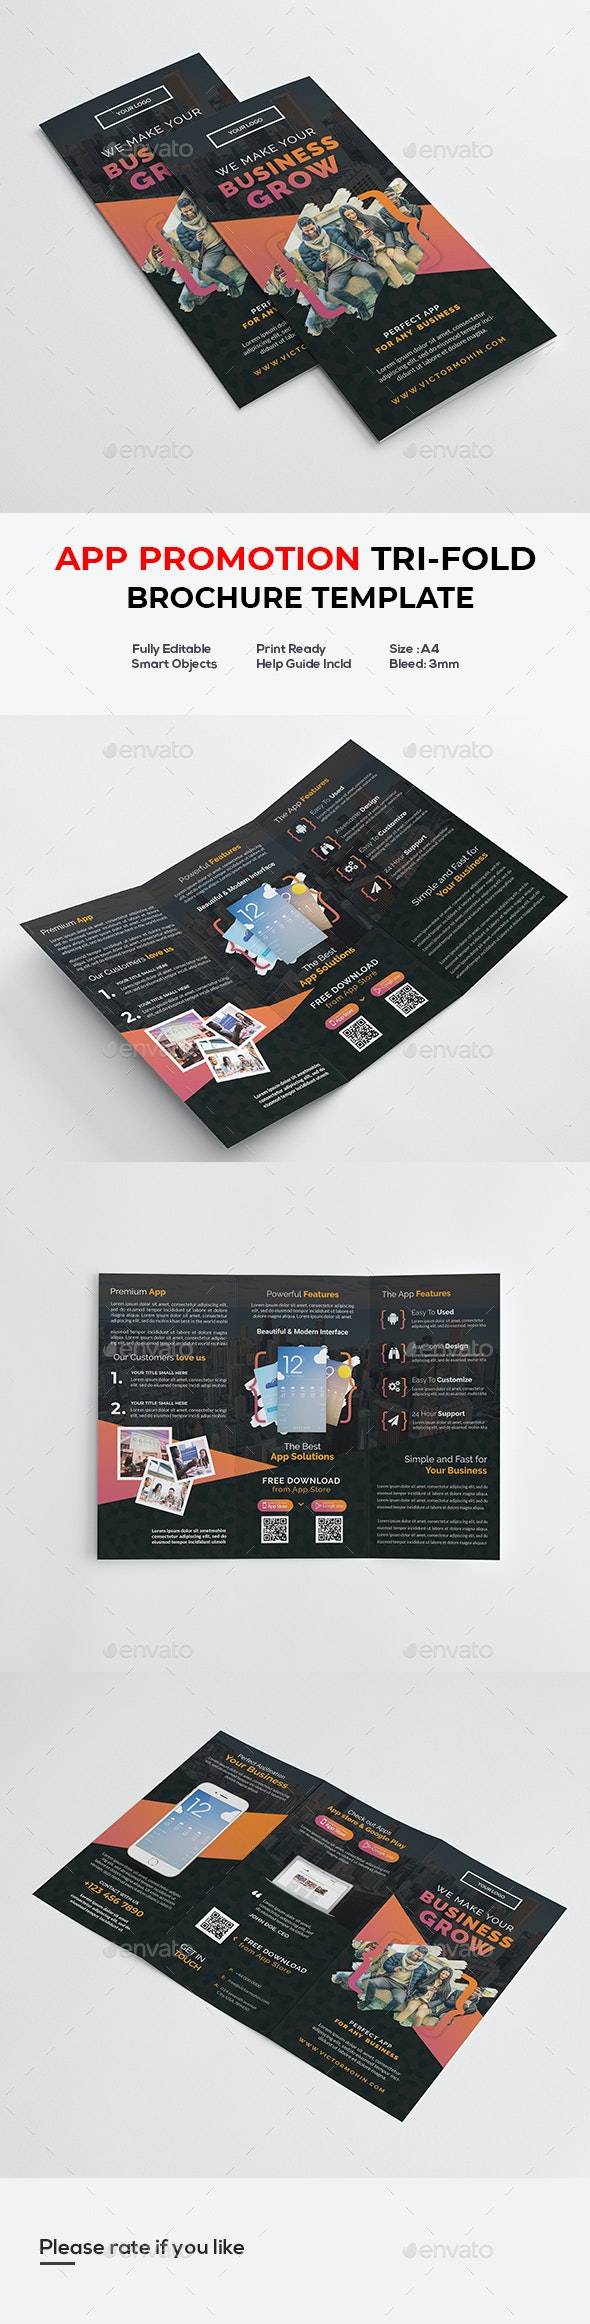 App Promotion Trifold Brochure - Informational Brochures